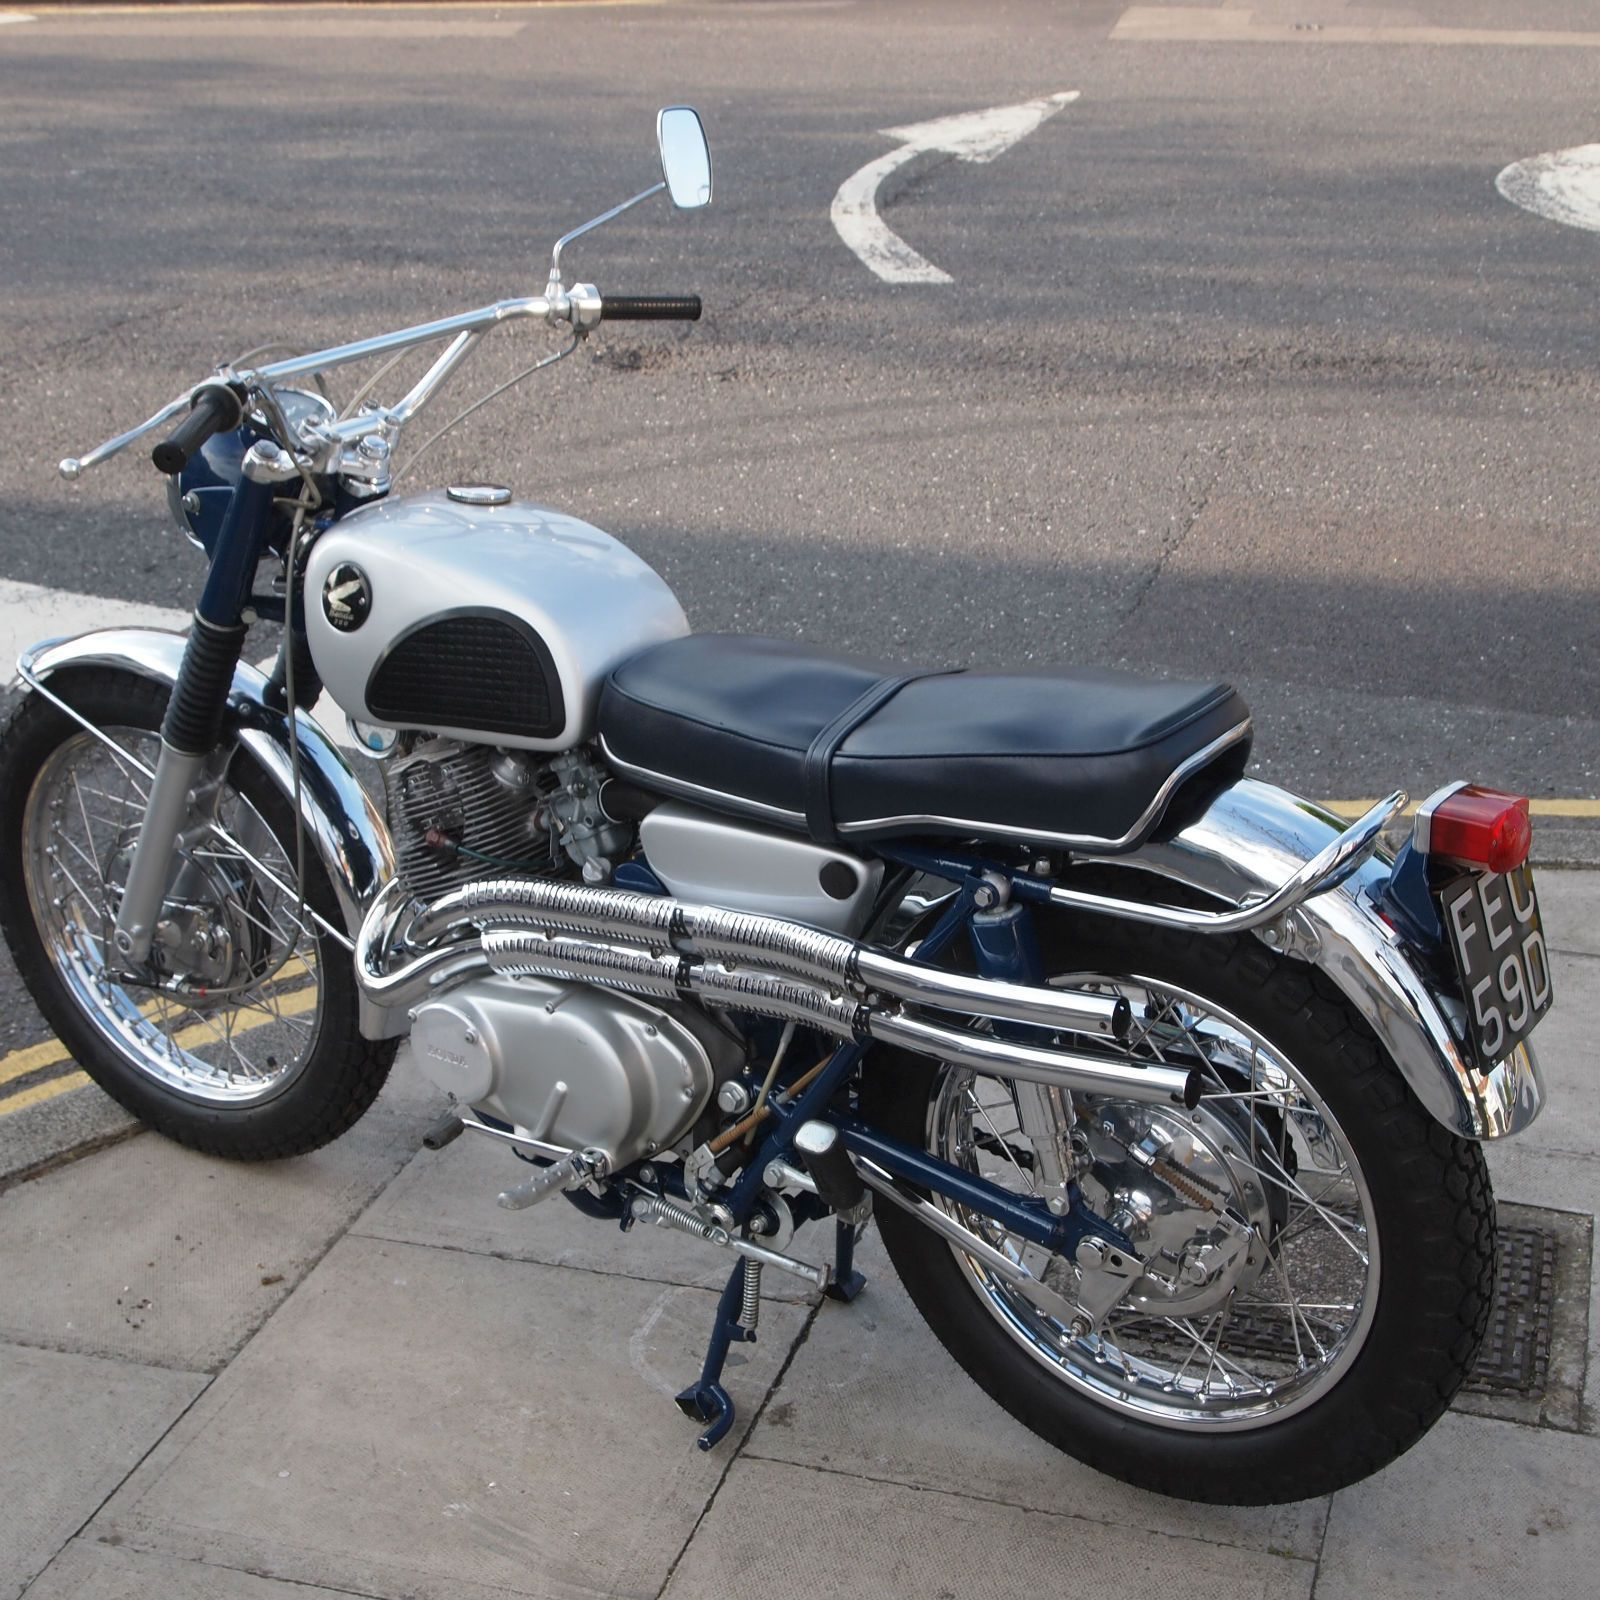 1966 Honda Cl77 Honda Bikes Vintage Honda Motorcycles Classic Motorcycles [ 1600 x 1600 Pixel ]